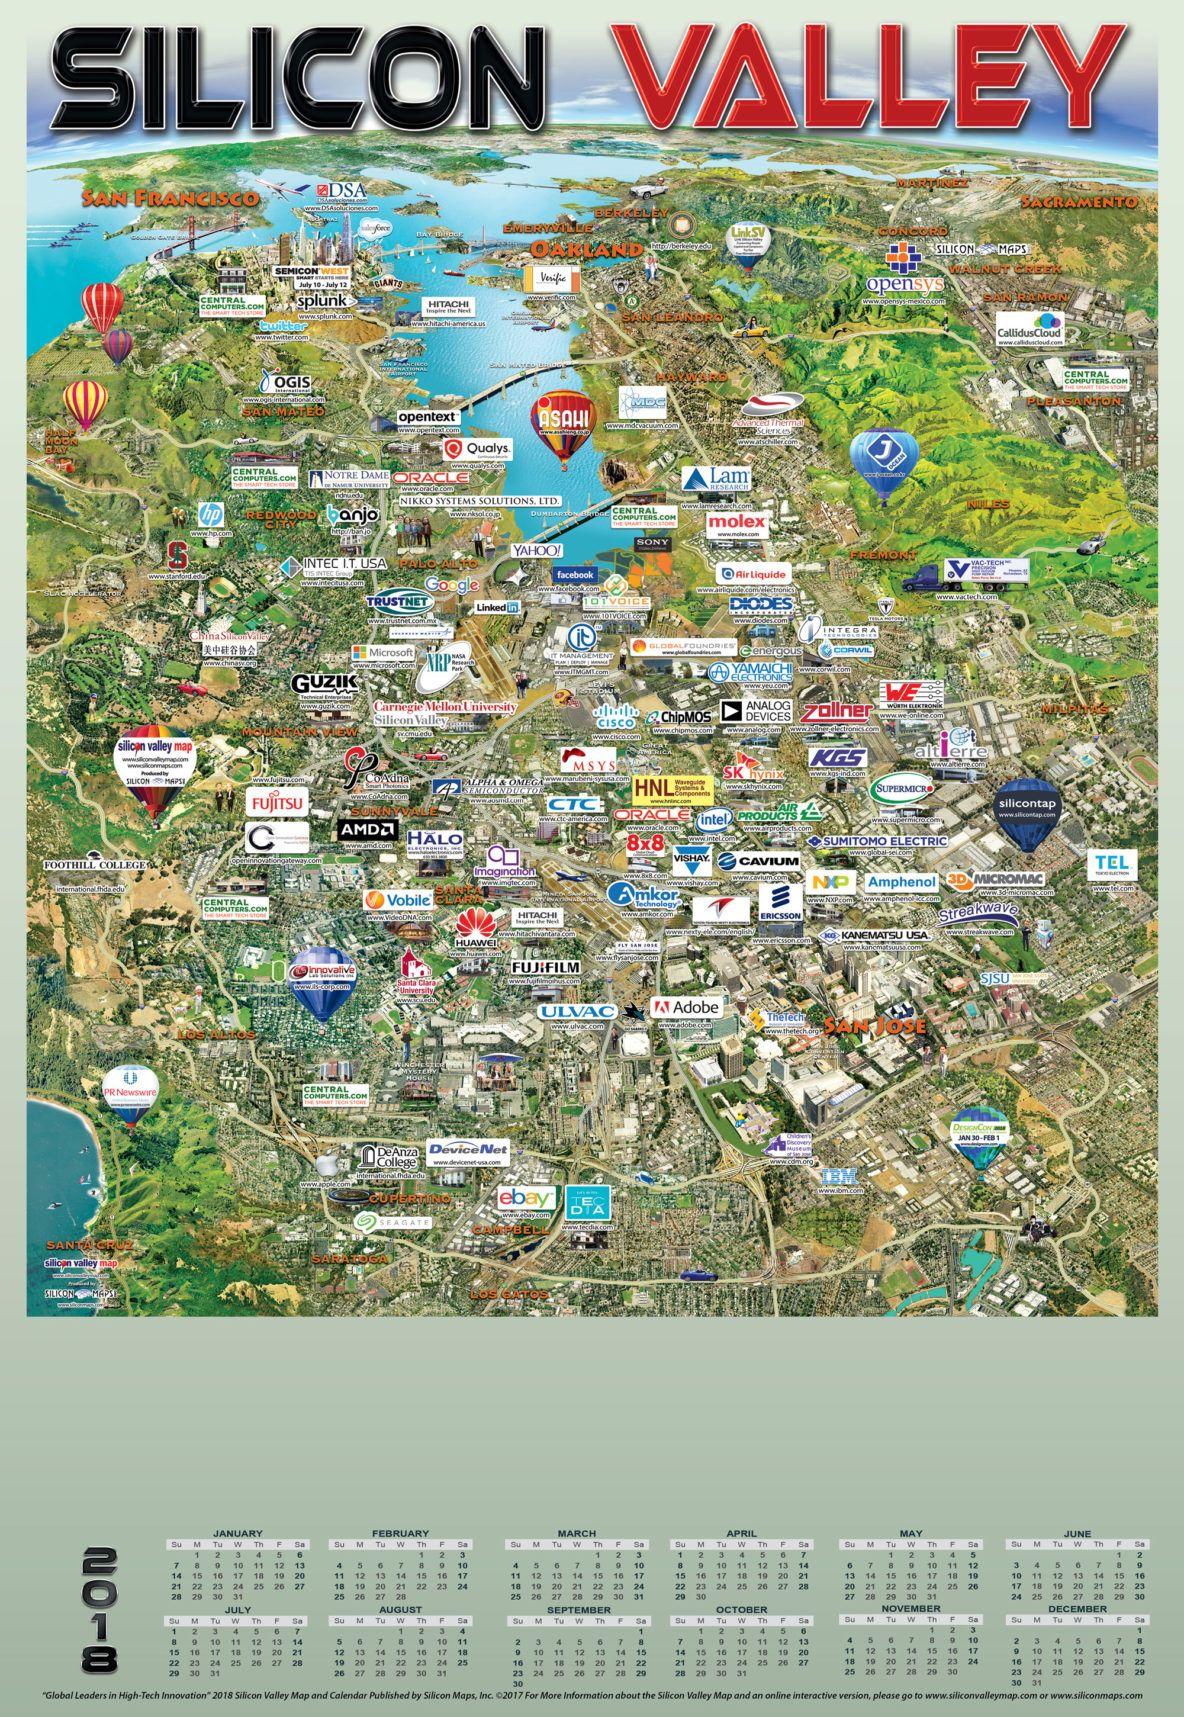 Silicon Valley Silicon valley california Forest